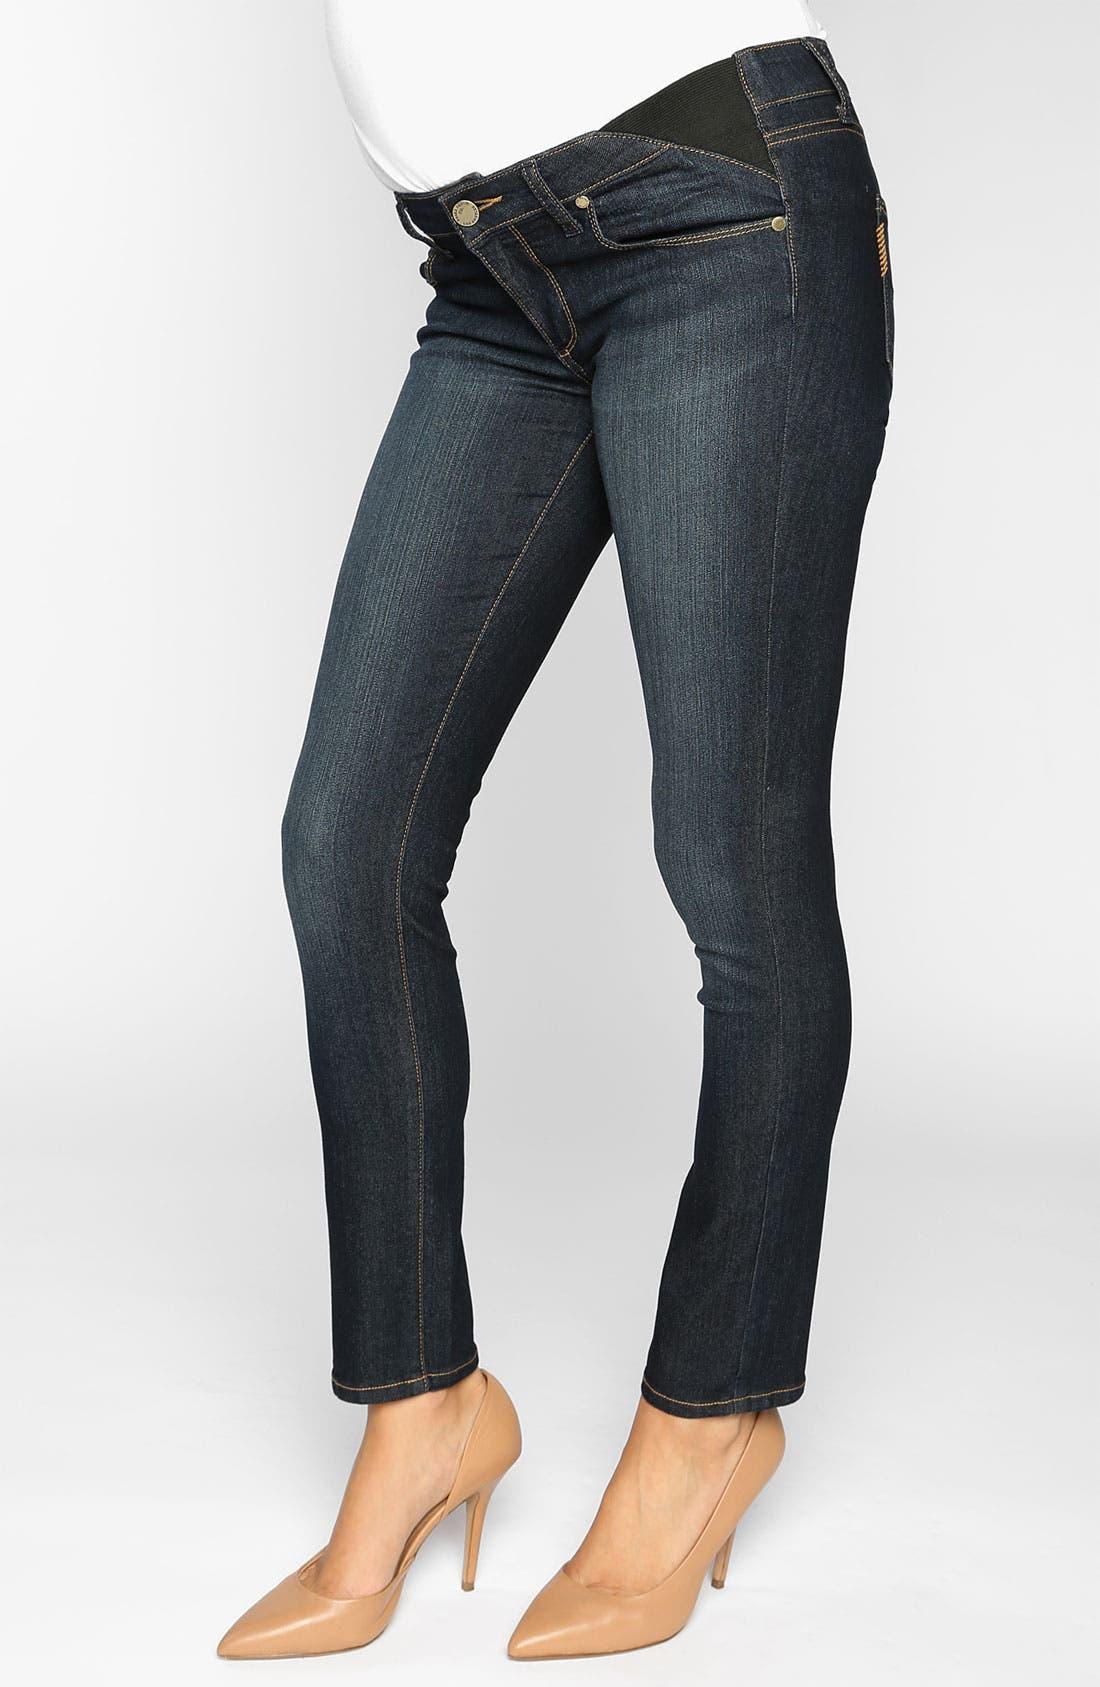 Main Image - Paige Maternity 'Union Skyline' Ankle Skinny Jeans (Carson)